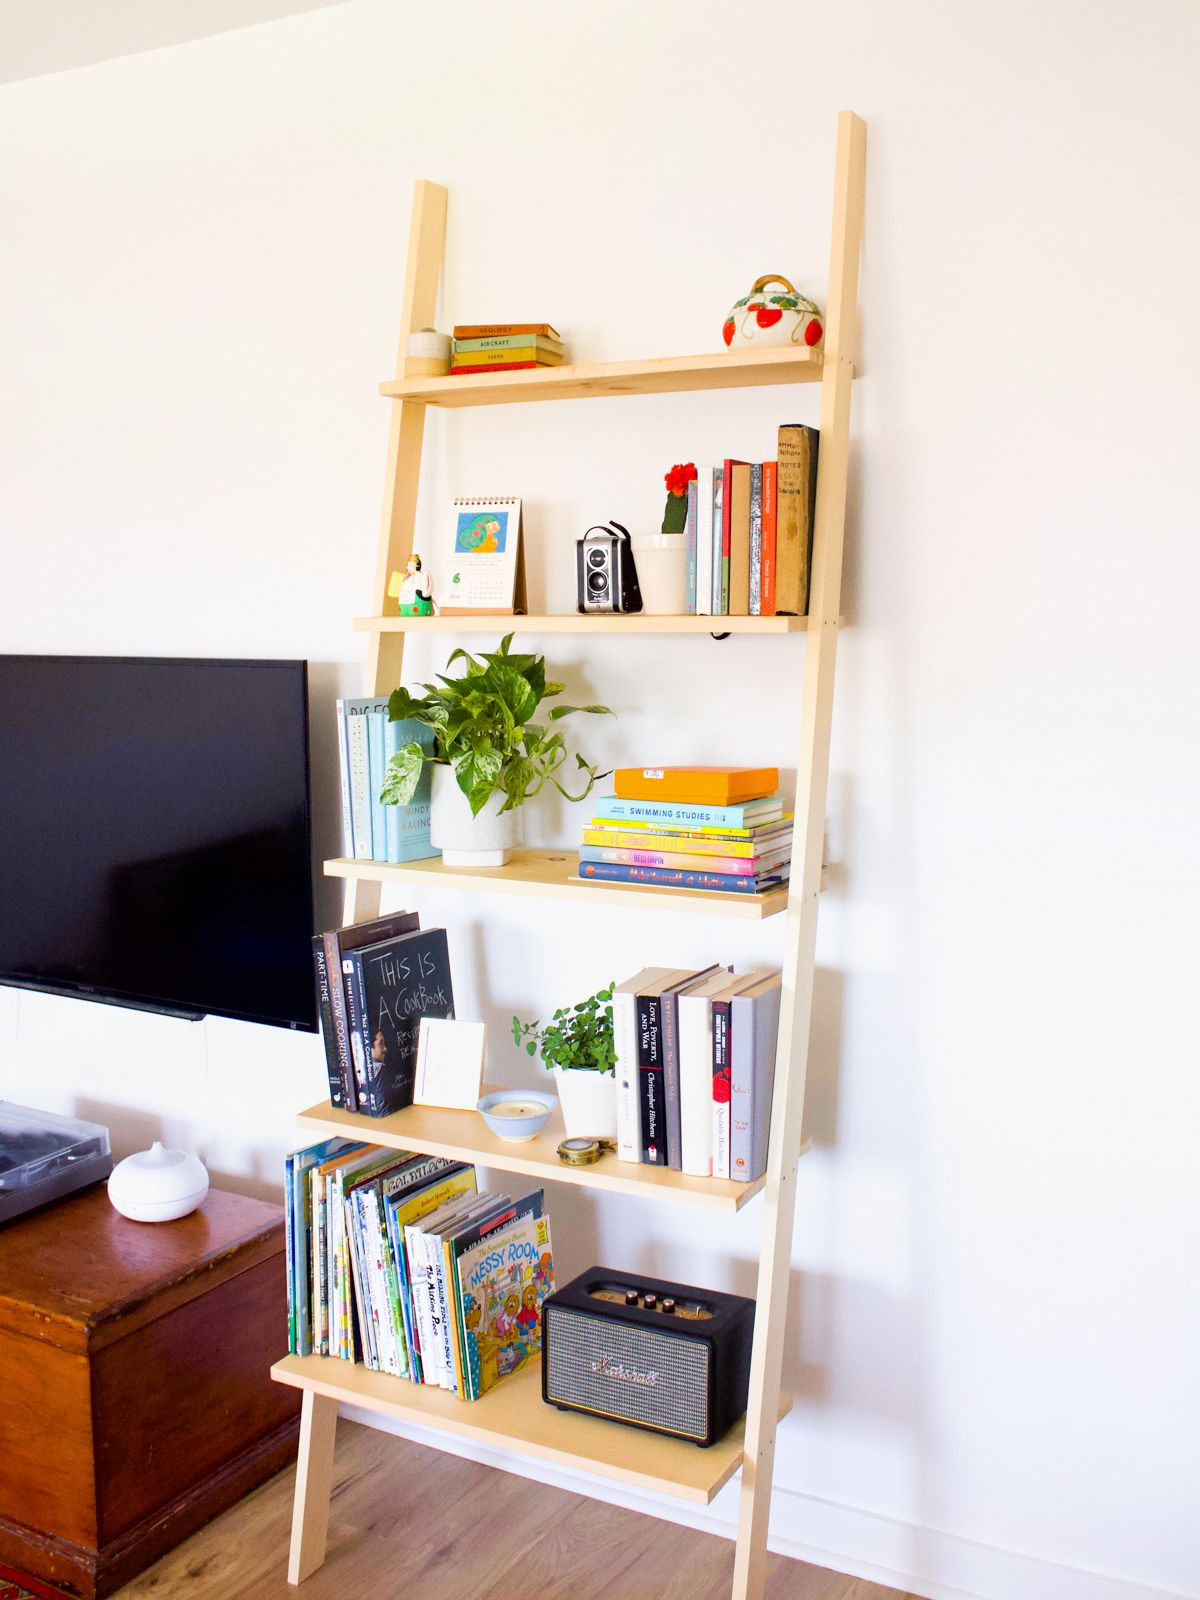 How to Build a DIY Leaning Bookshelf Leaning bookshelf